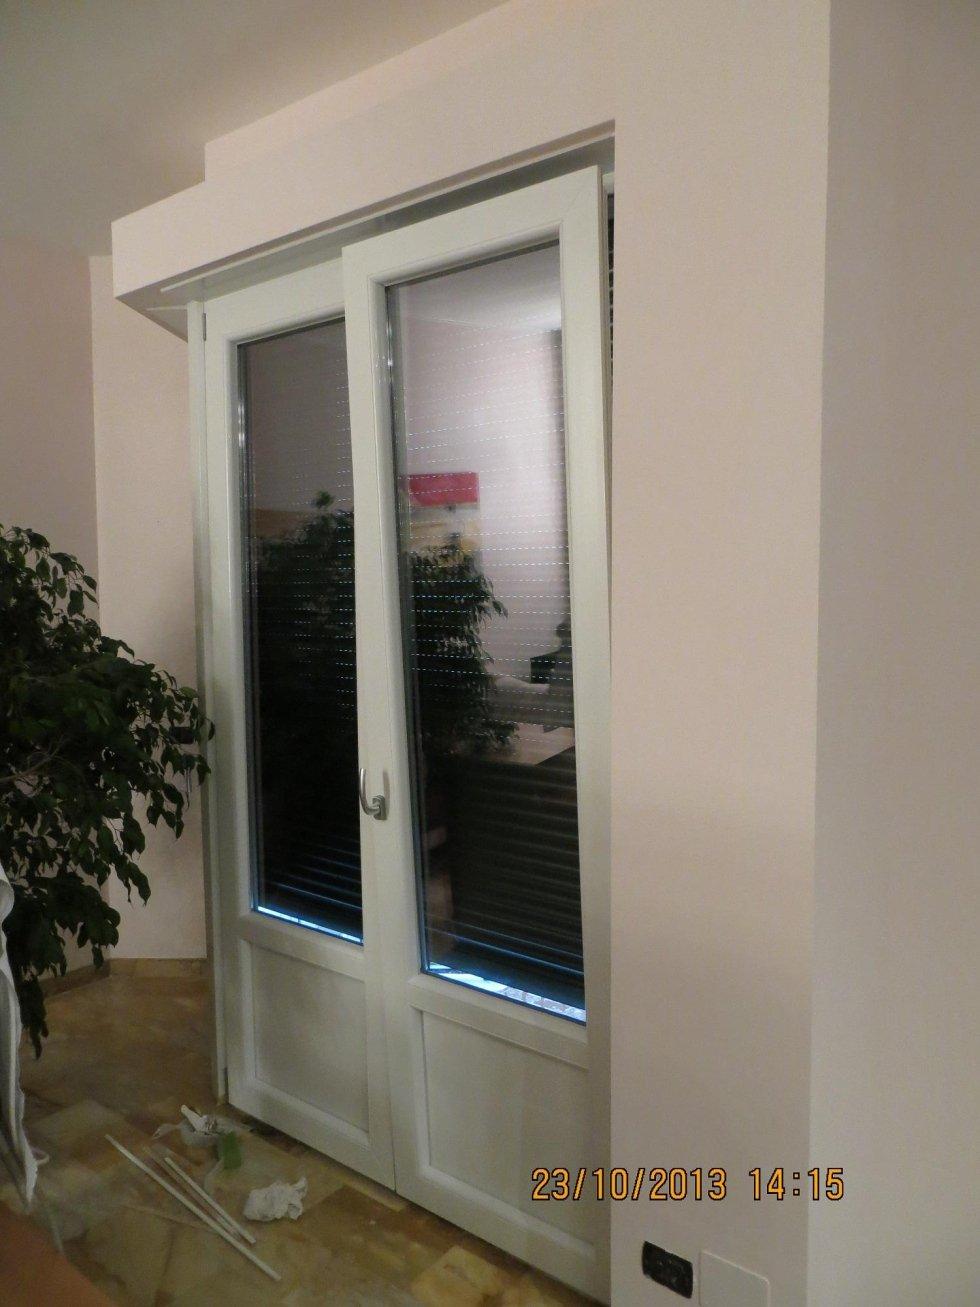 vista laterale di una porta finestra a vasistas